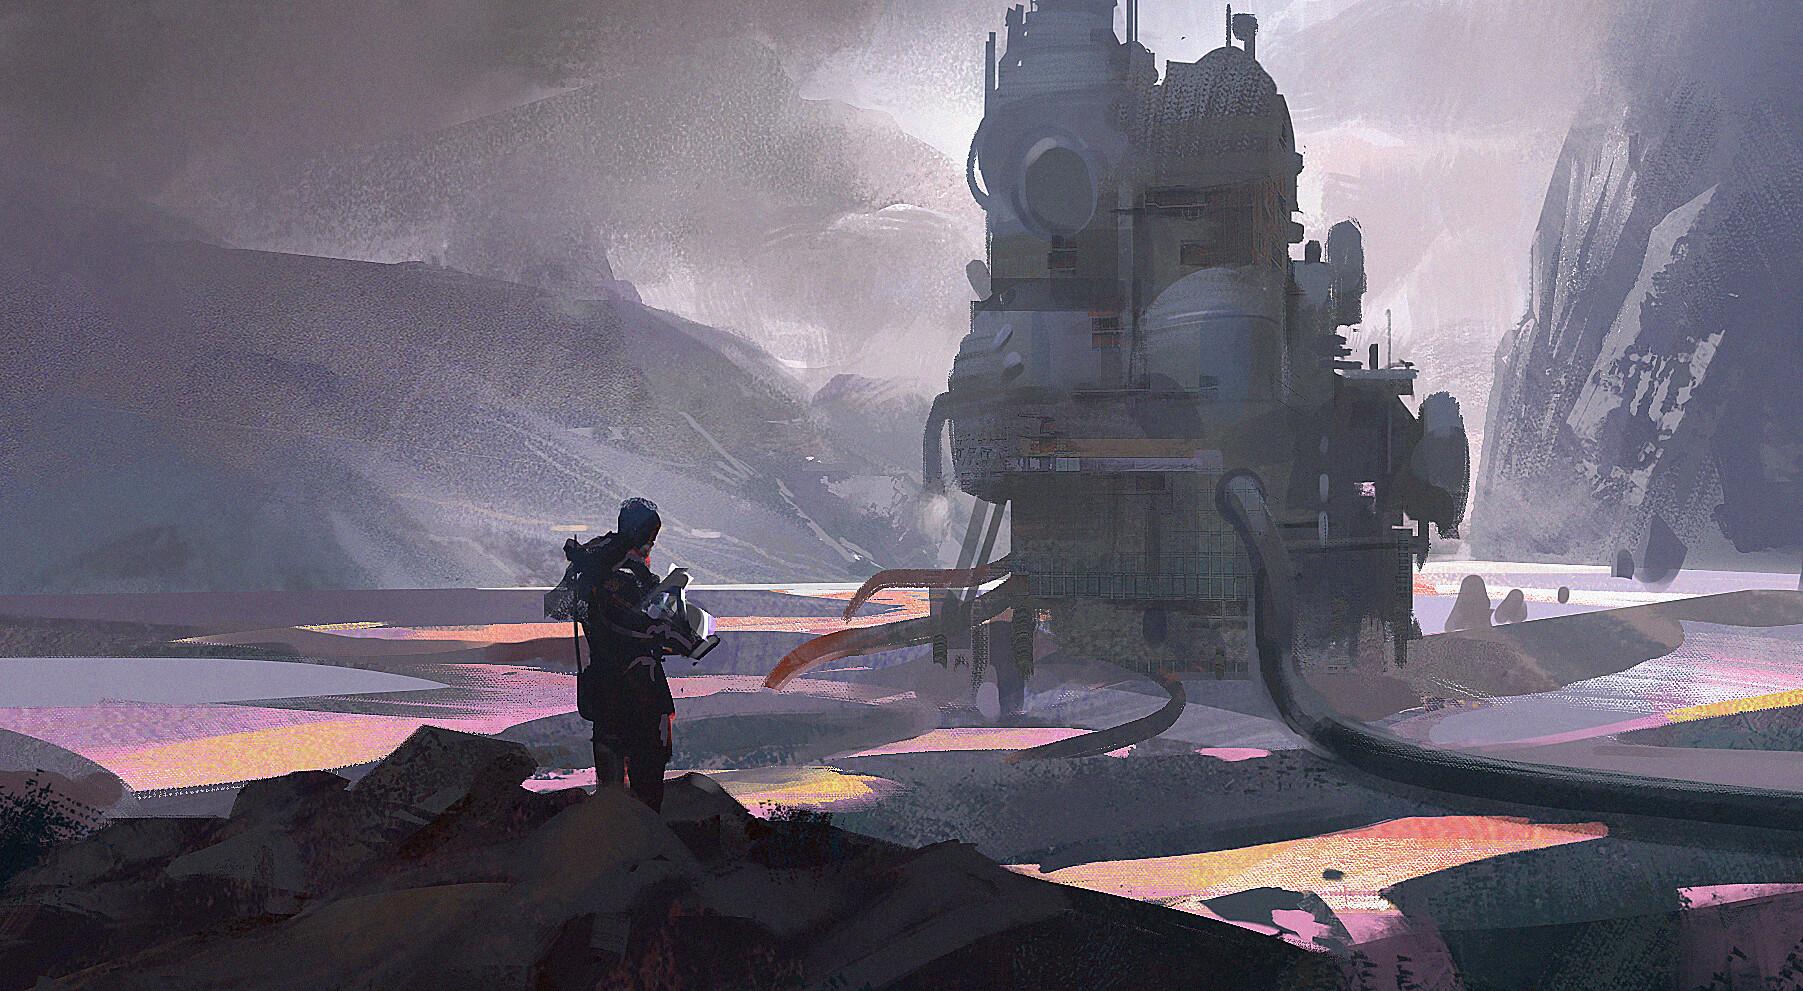 Liang mark daliy sketch 4